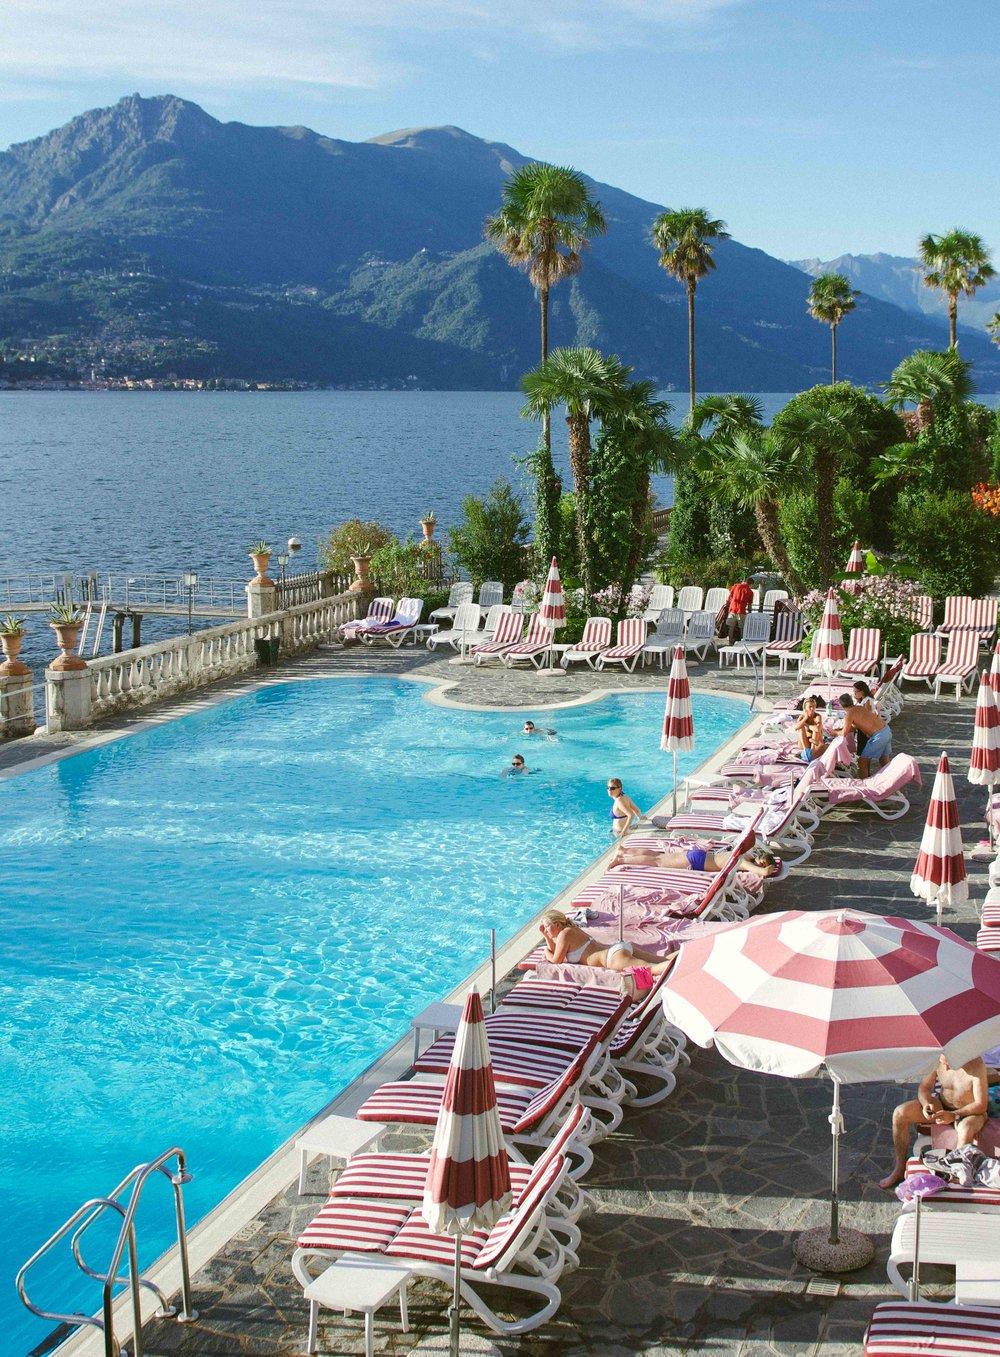 LAKE COMO ITALY - VIA TOLILA